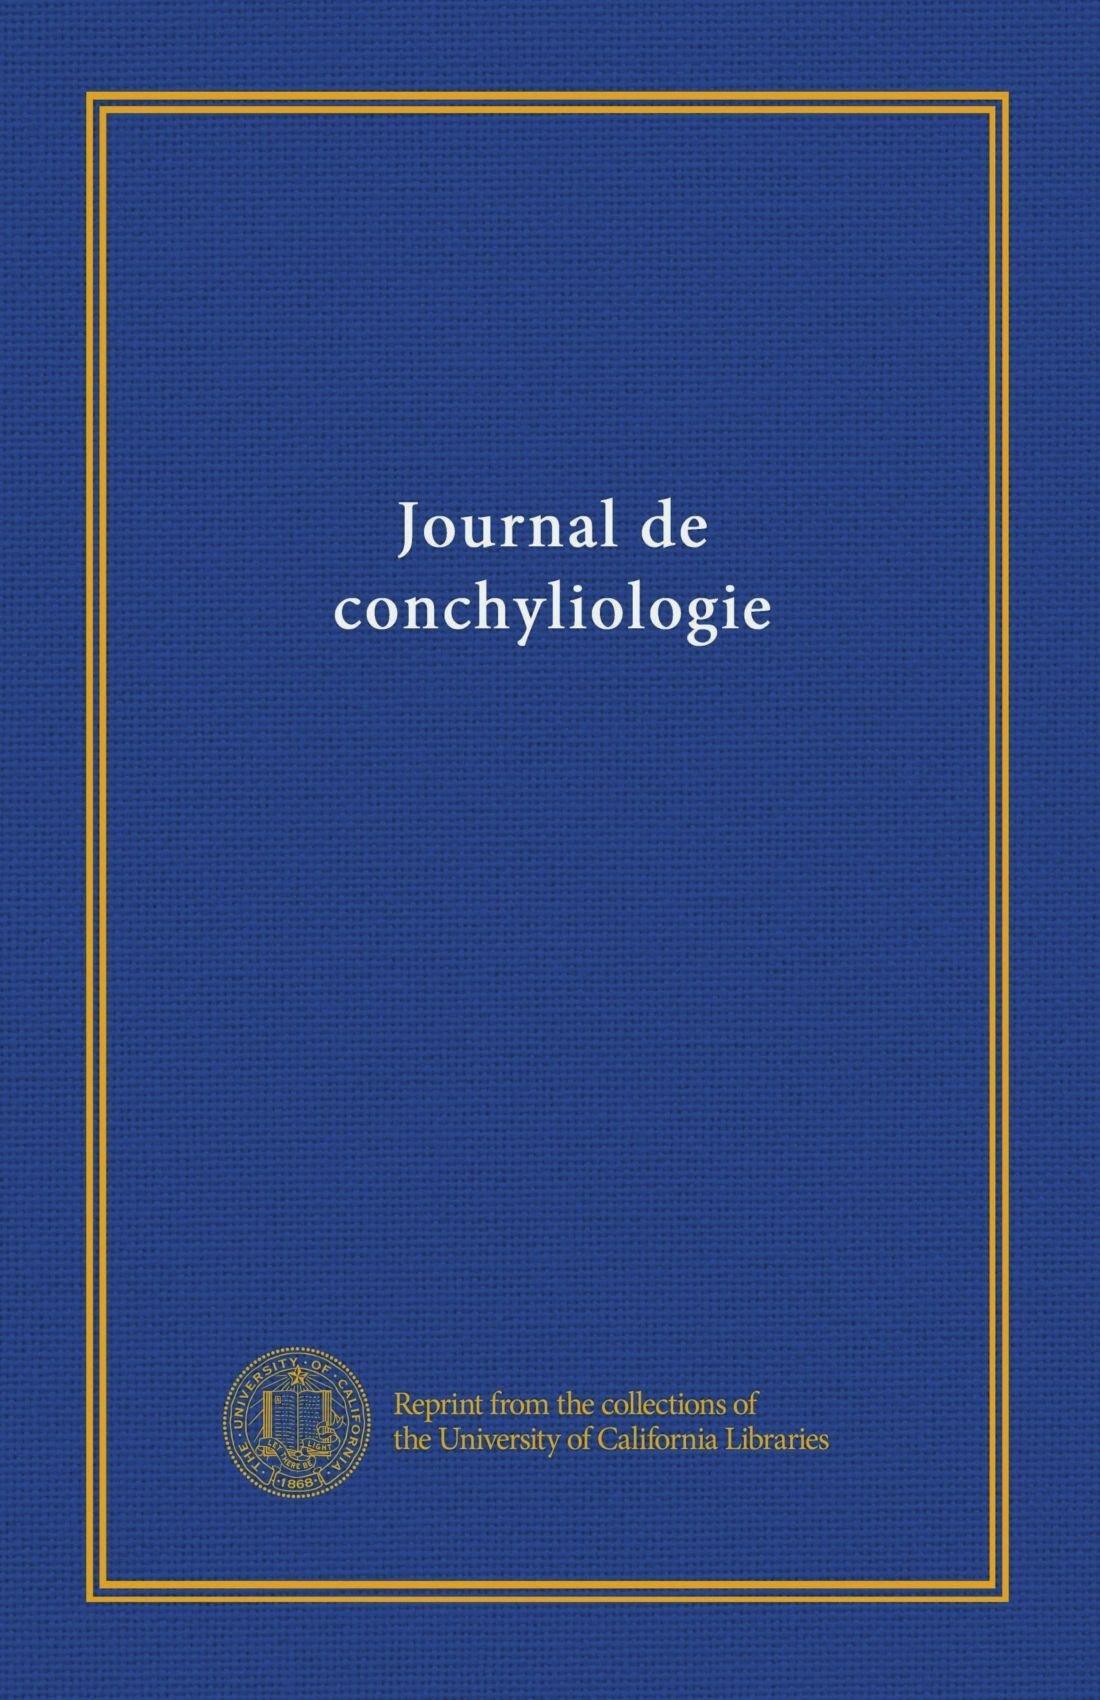 Download Journal de conchyliologie (v.27 (1879)) (French Edition) ebook